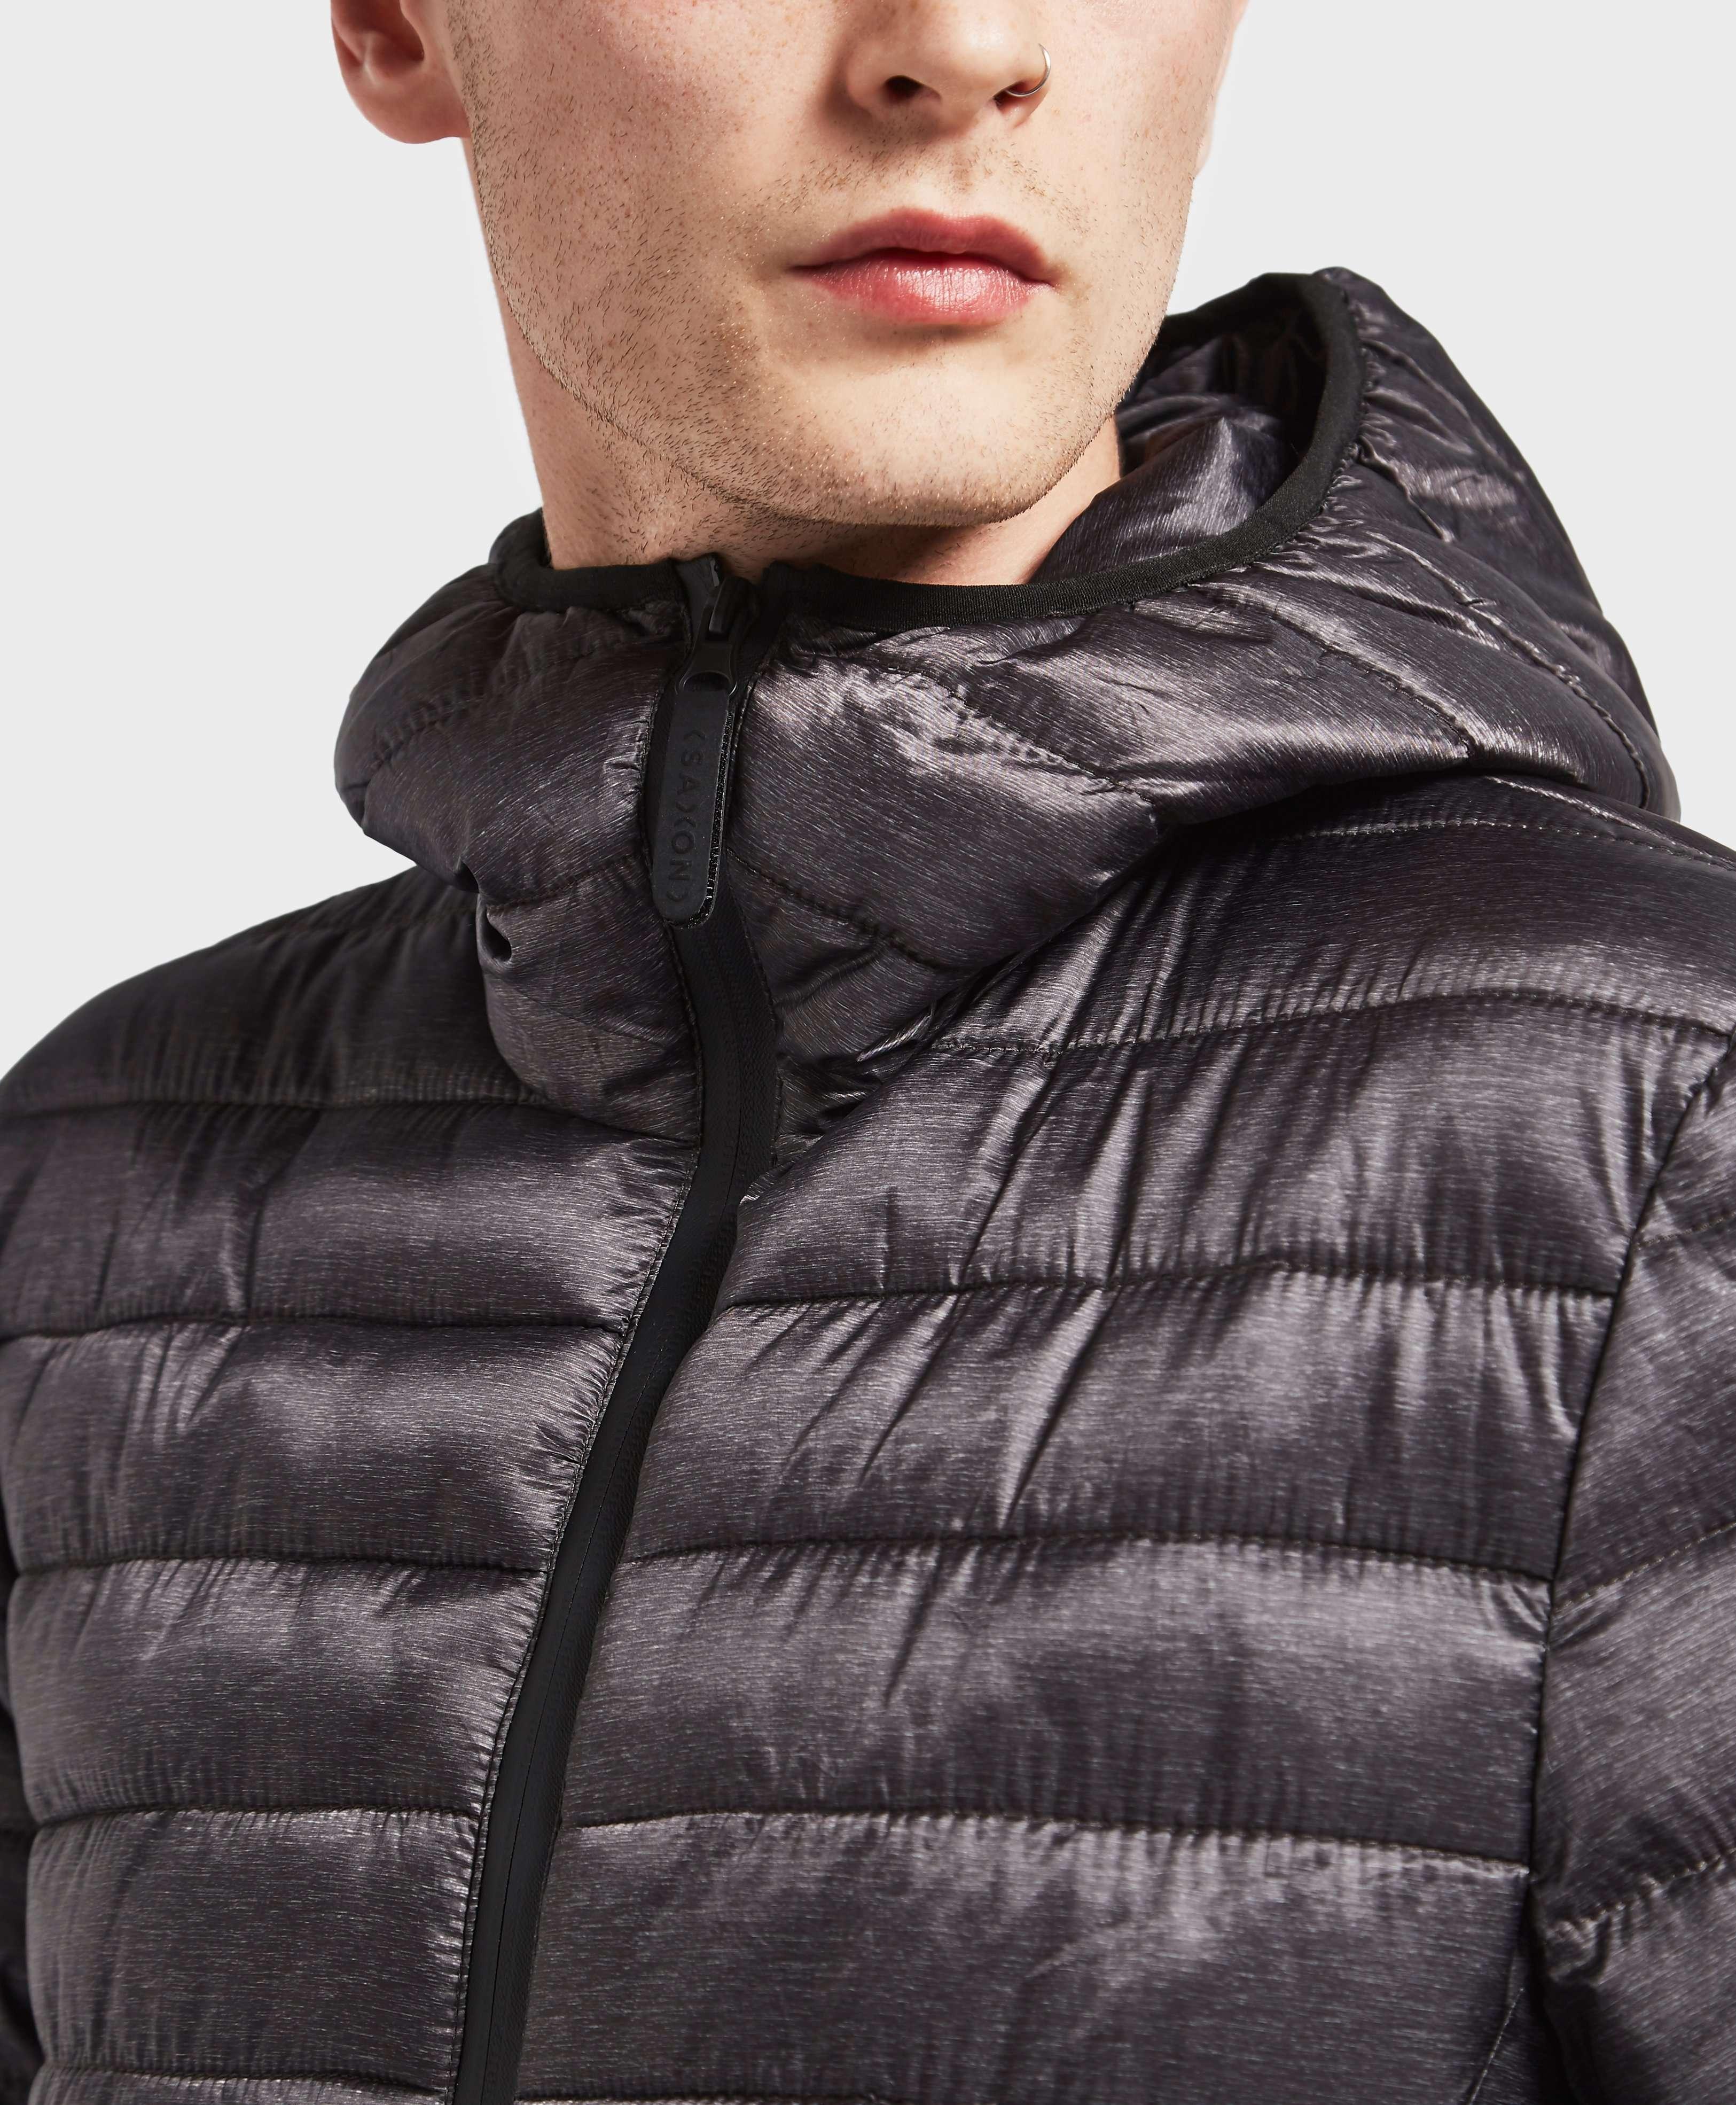 One True Saxon Debar Padded Jacket - Exclusive